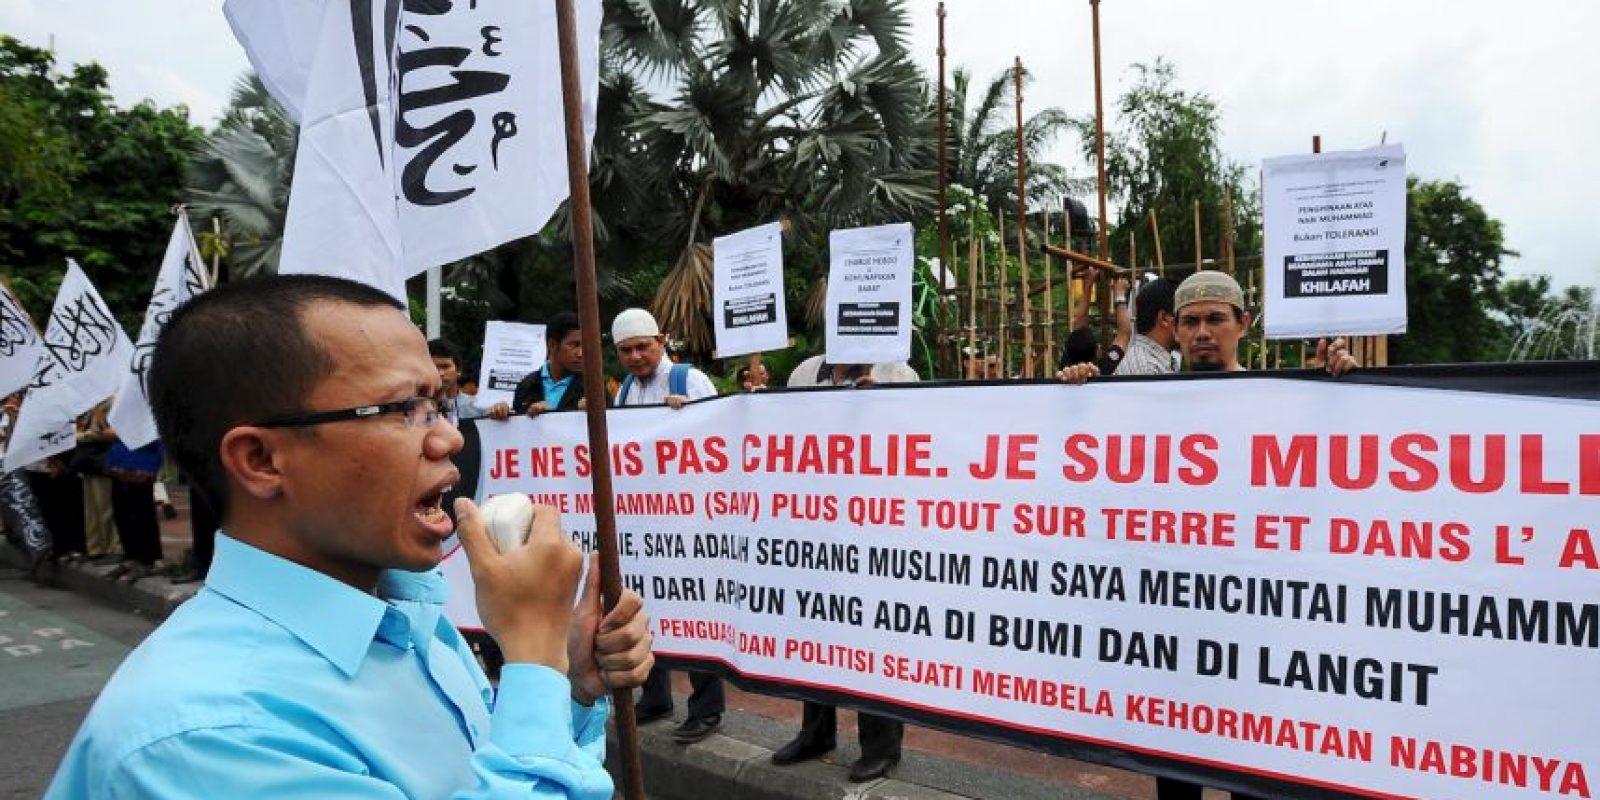 Creen que es una ofensa para el profeta Mahoma. Foto:Getty Images